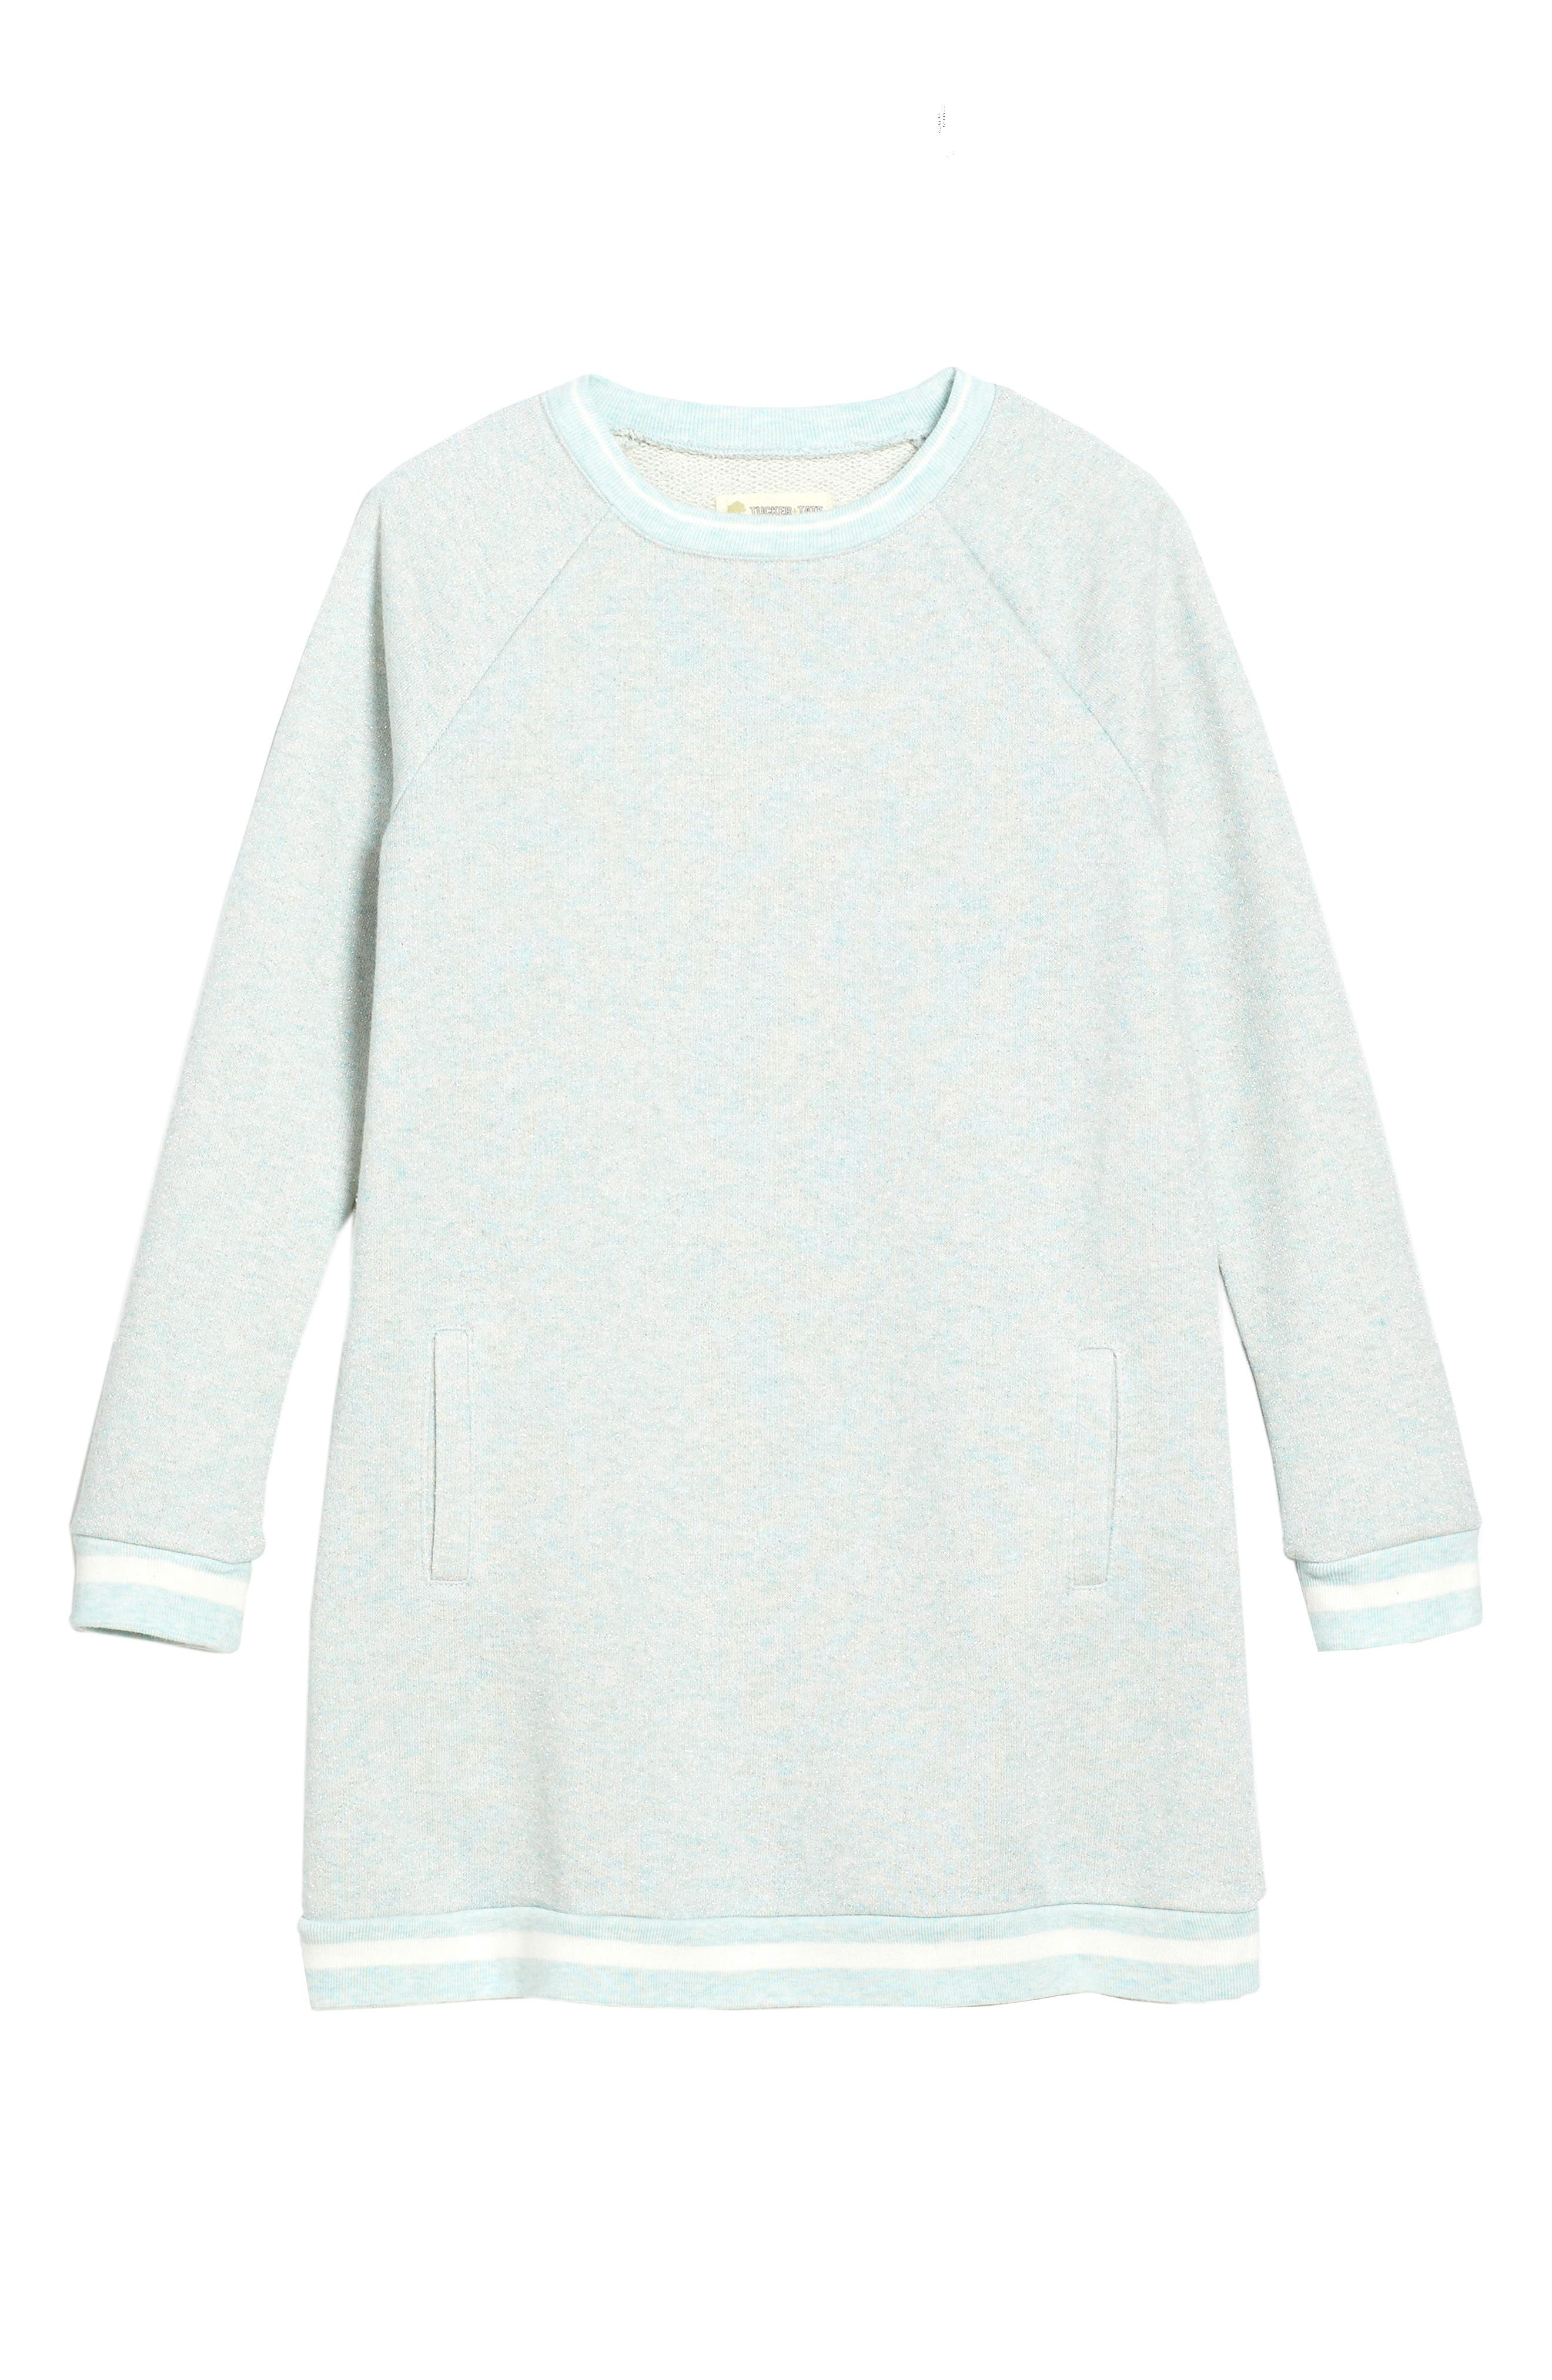 Main Image - Tucker + Tate Sparkle Terry Dress (Toddler Girls, Little Girls & Big Girls)